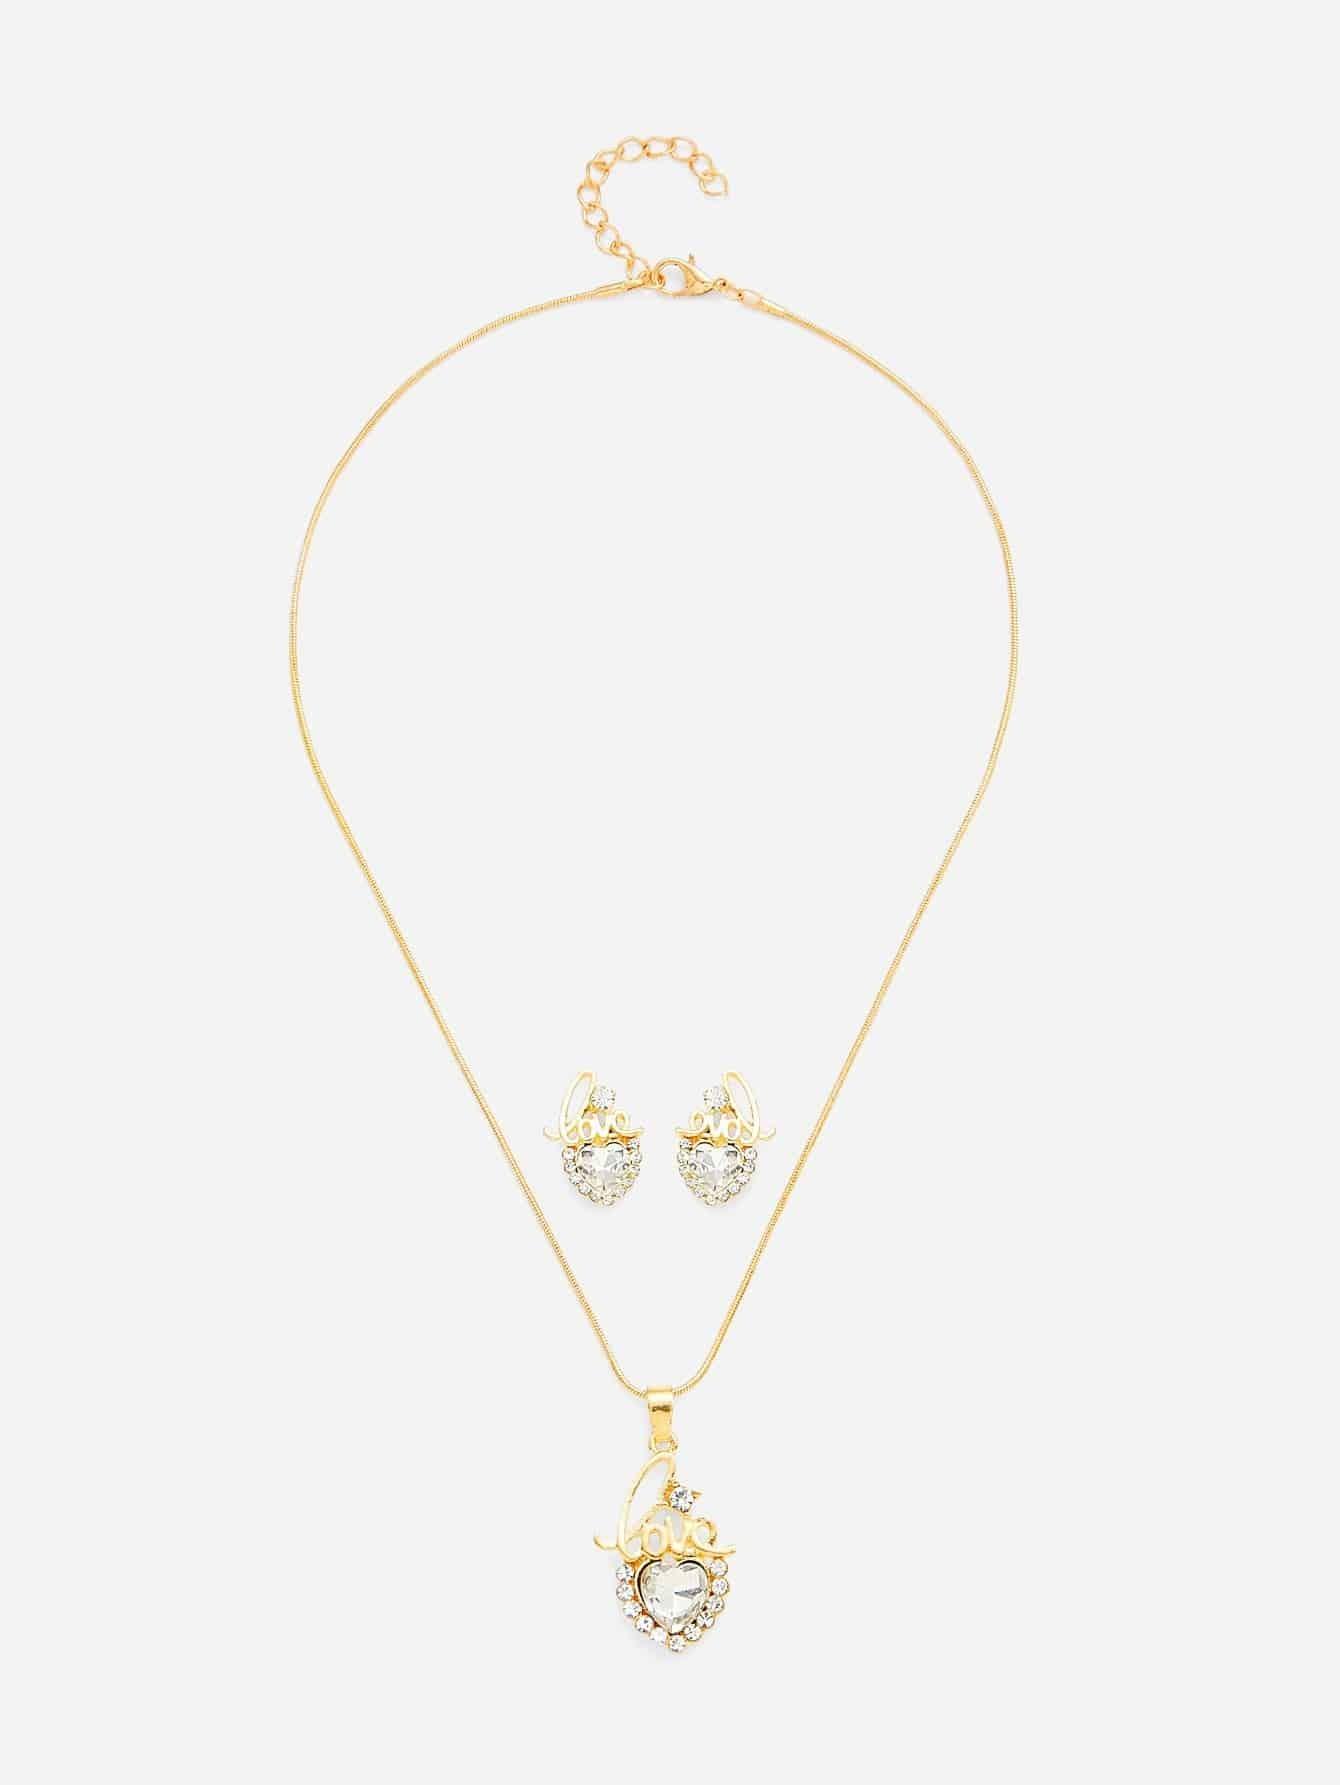 Heart Shaped Pendant Necklace & Stud Earring Set er 3789 stylish retro jewelled pendant earring navy blue 2 pcs